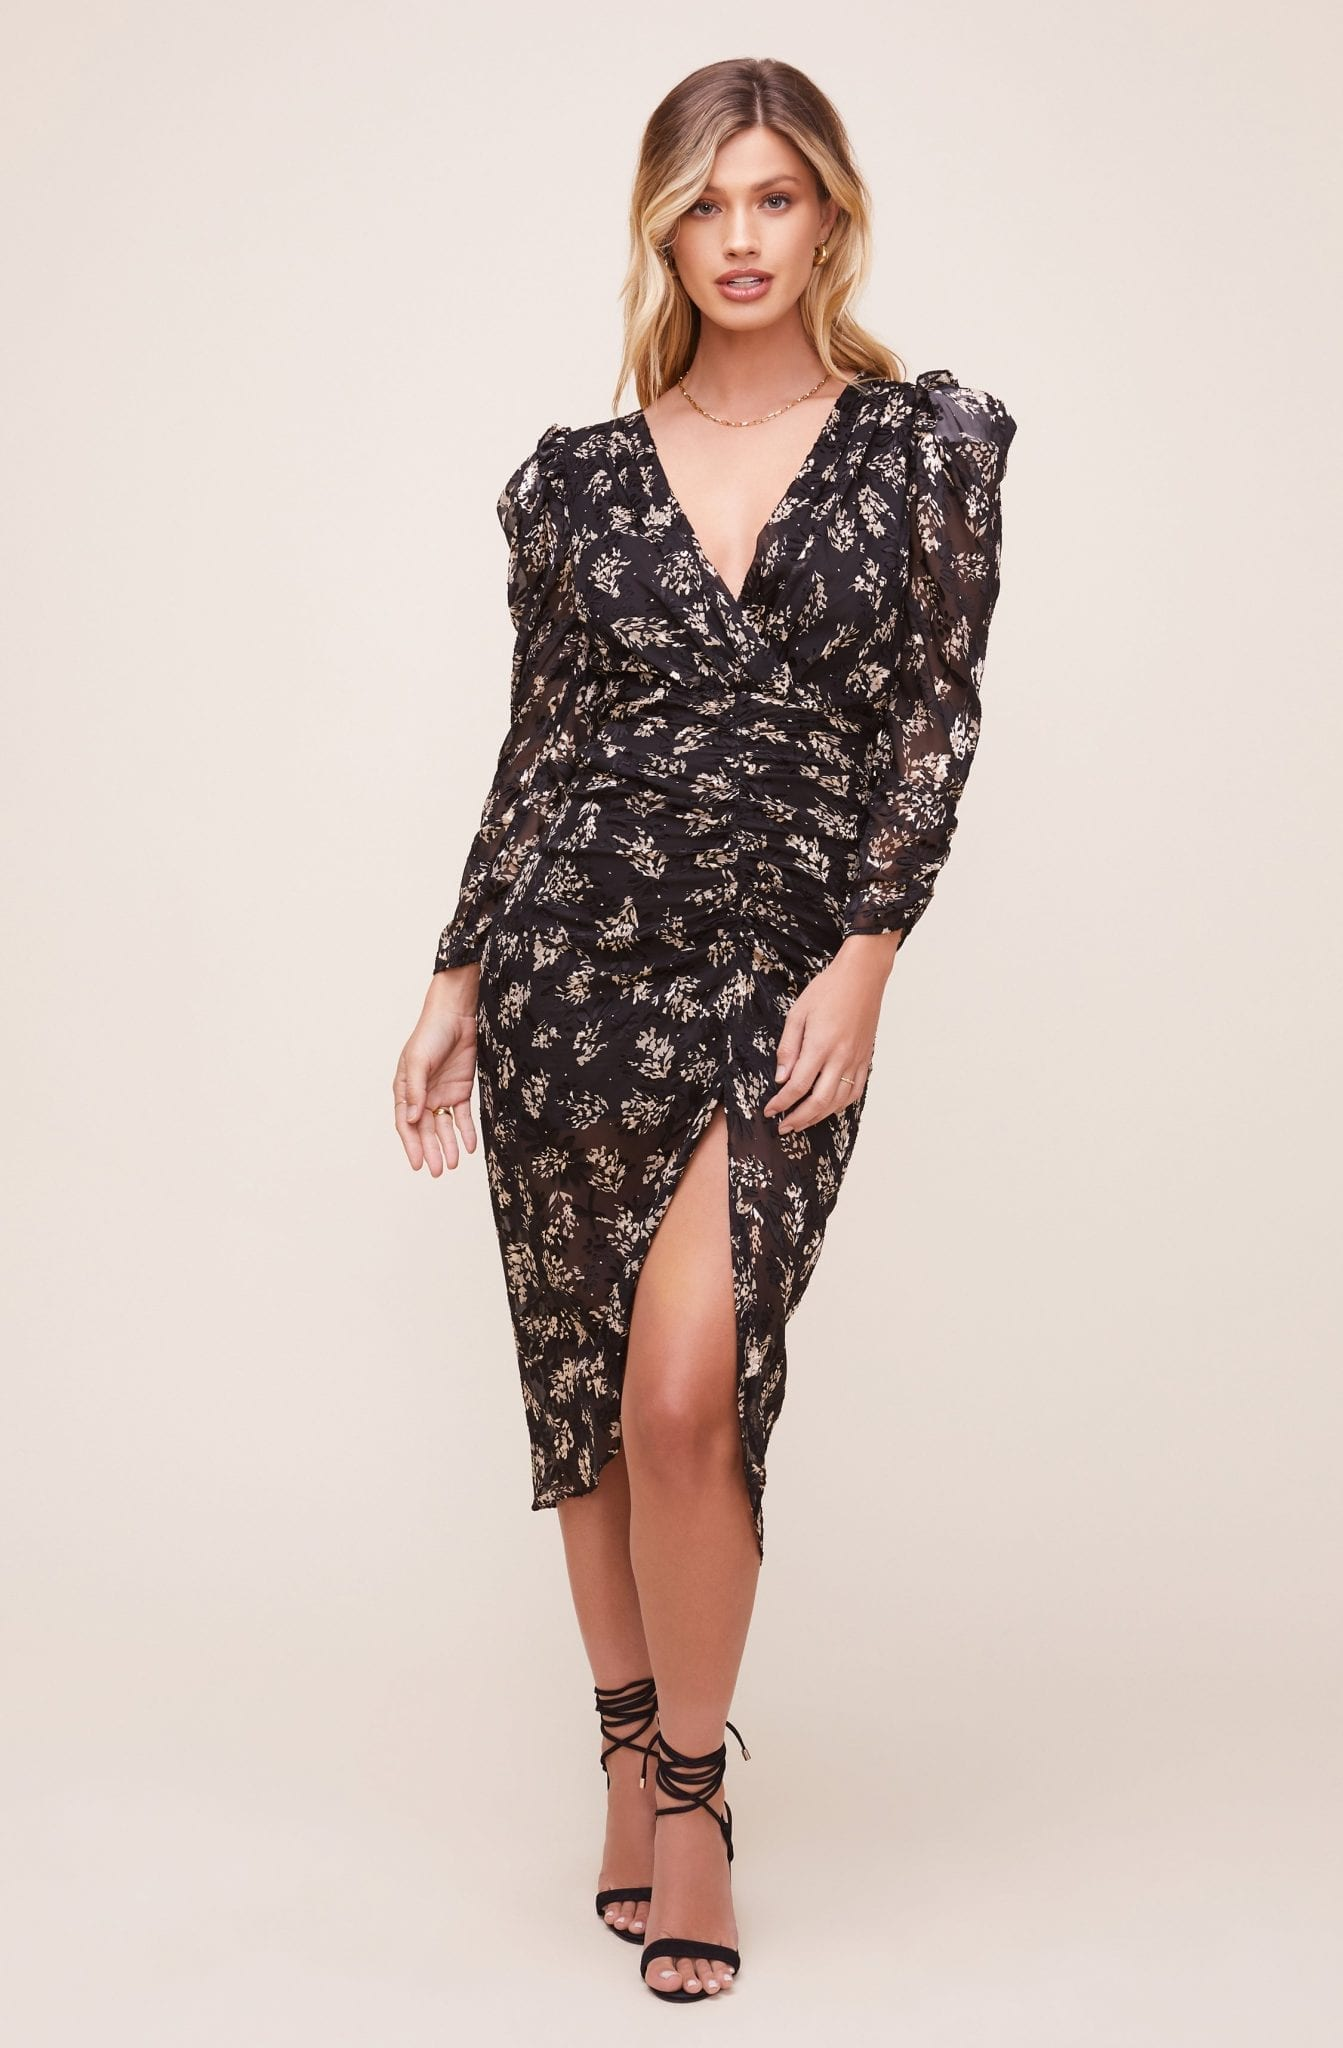 ASTRTHELABEL Maven Dress